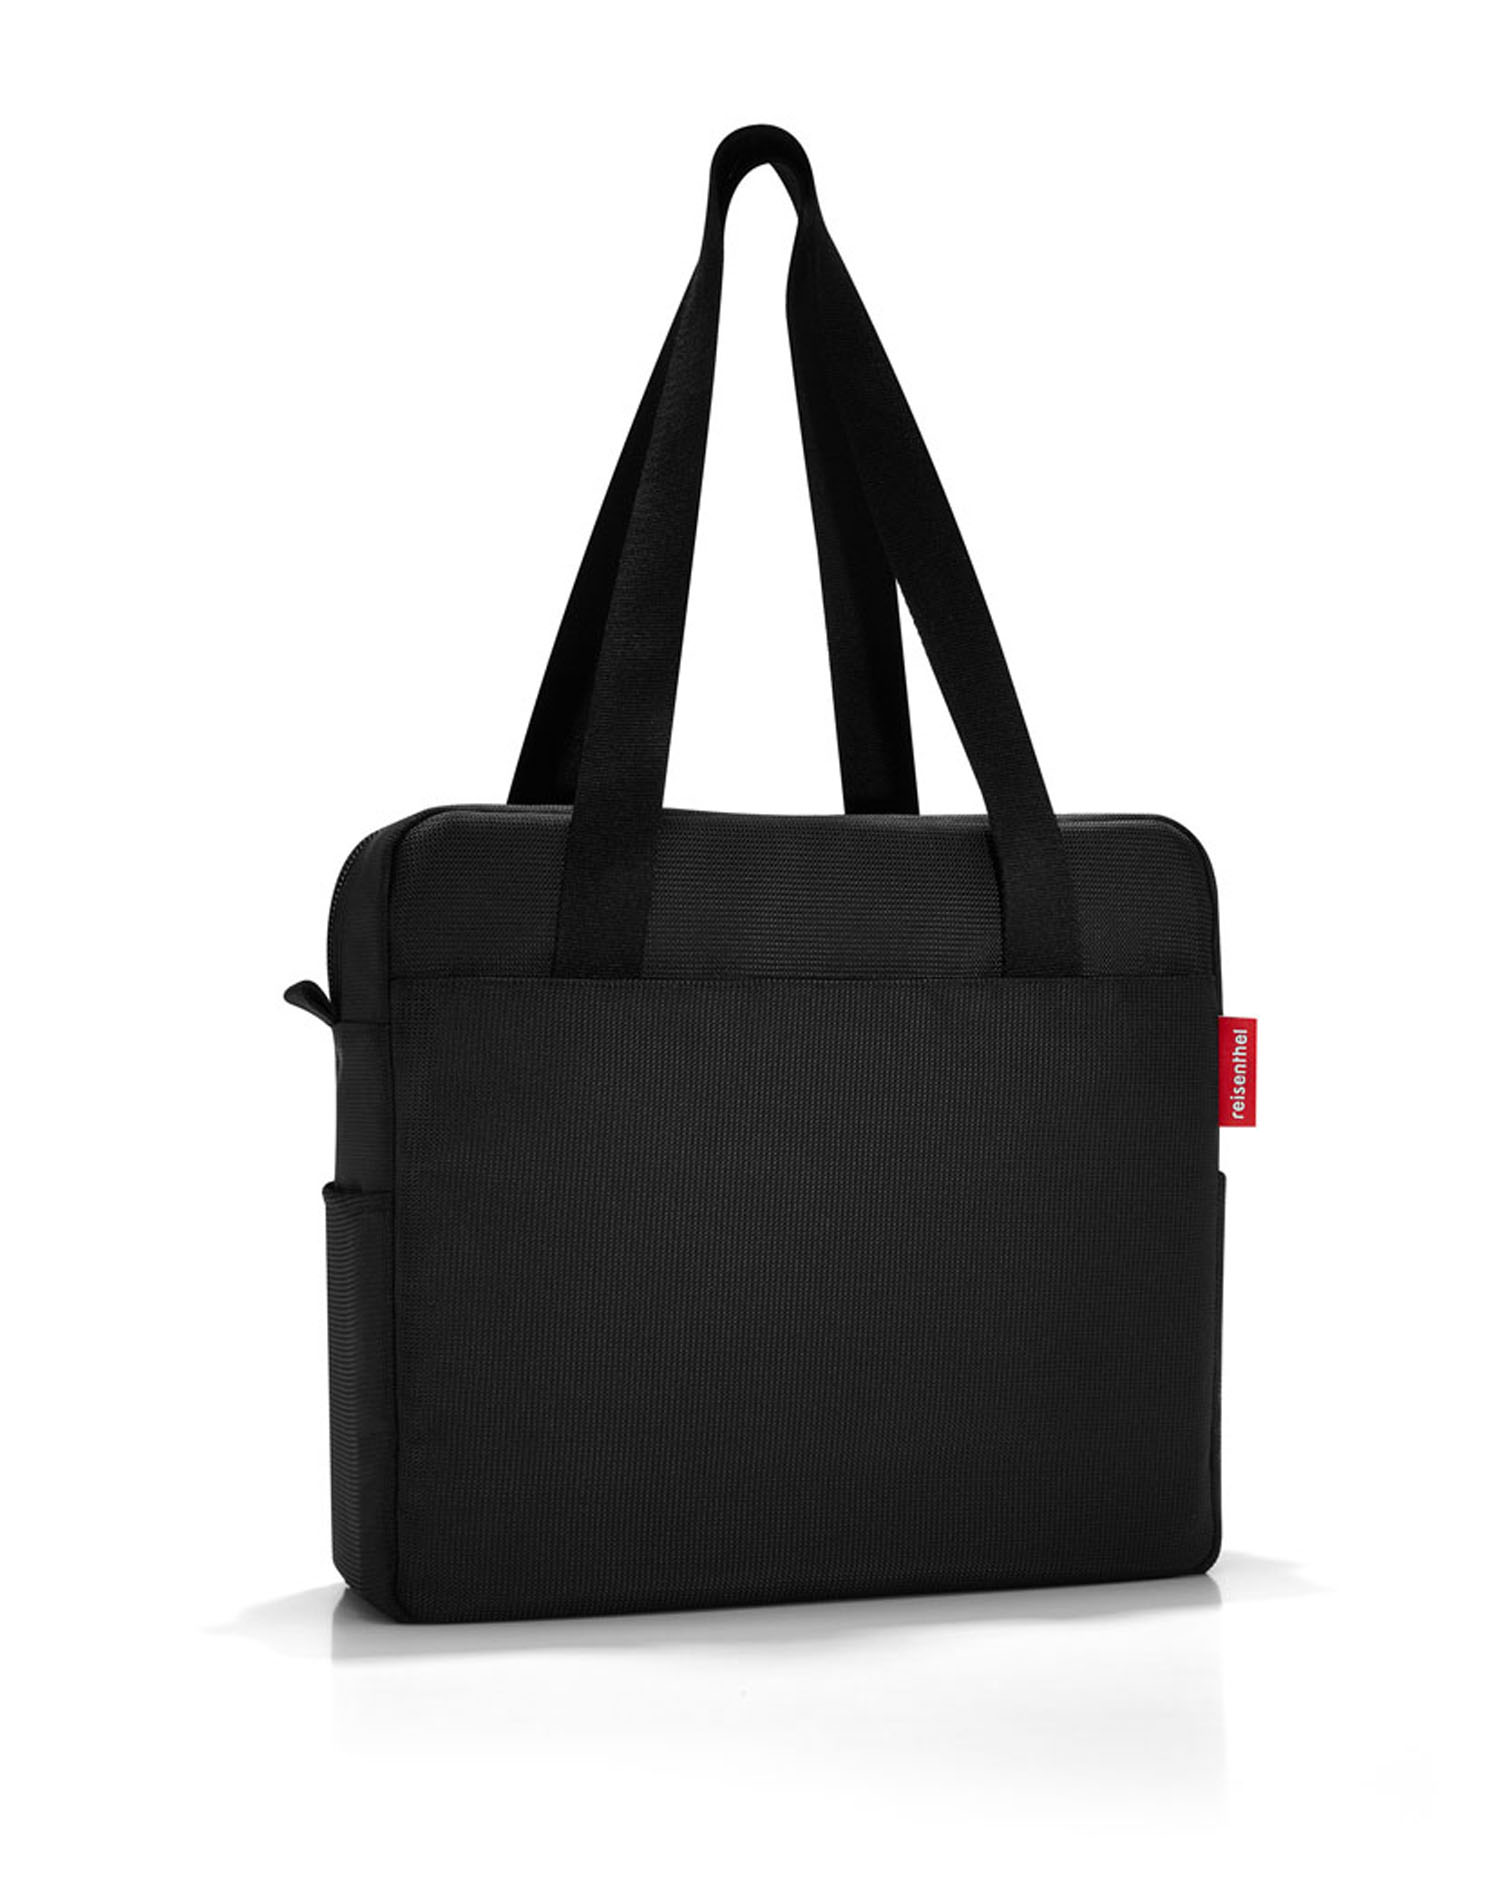 Reisenthel business businessbag Black HD7003